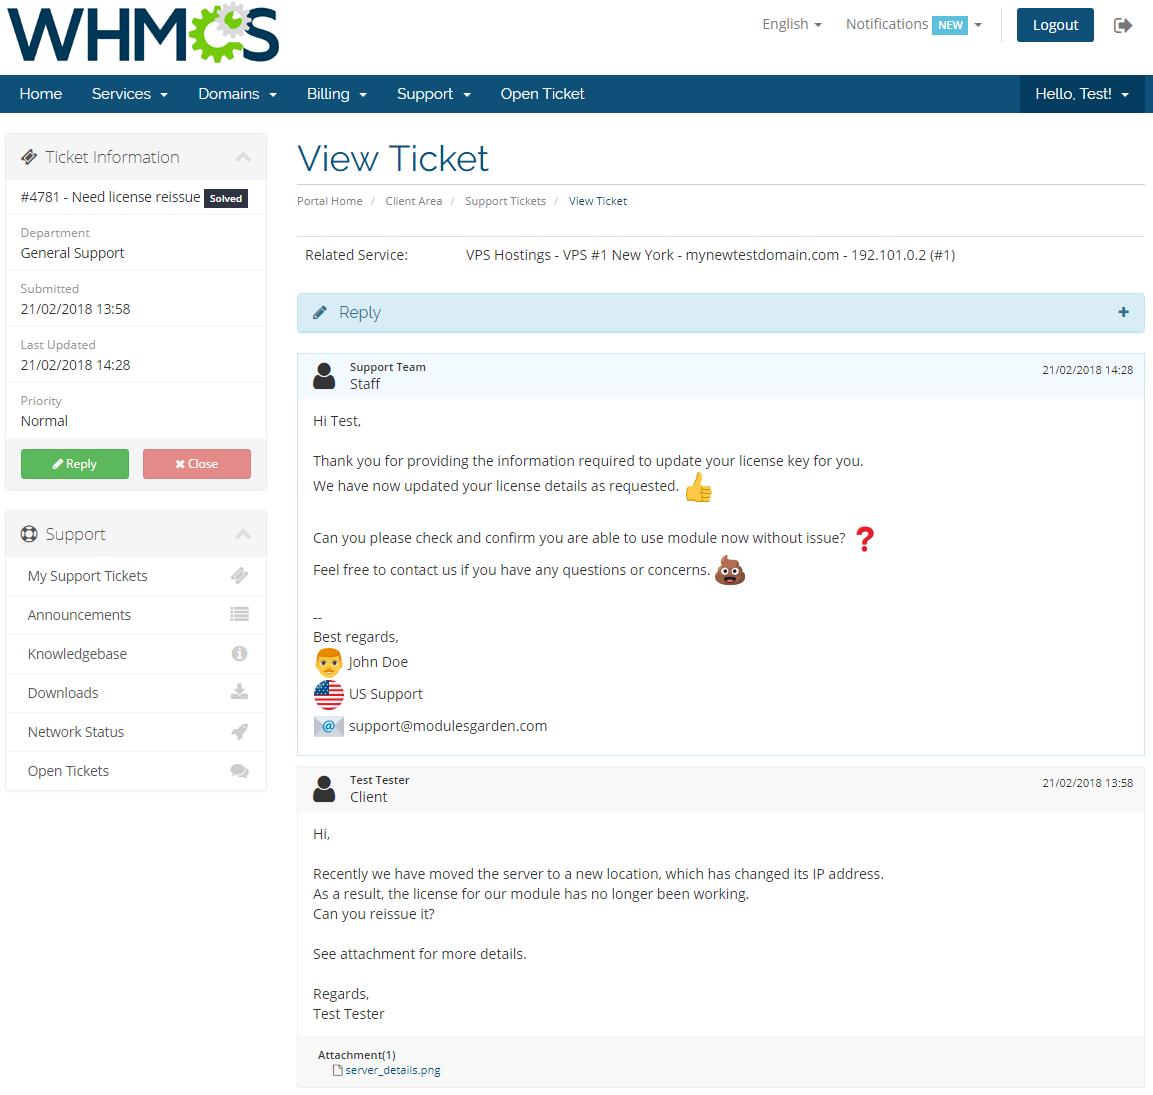 Zendesk For WHMCS: Screen 4